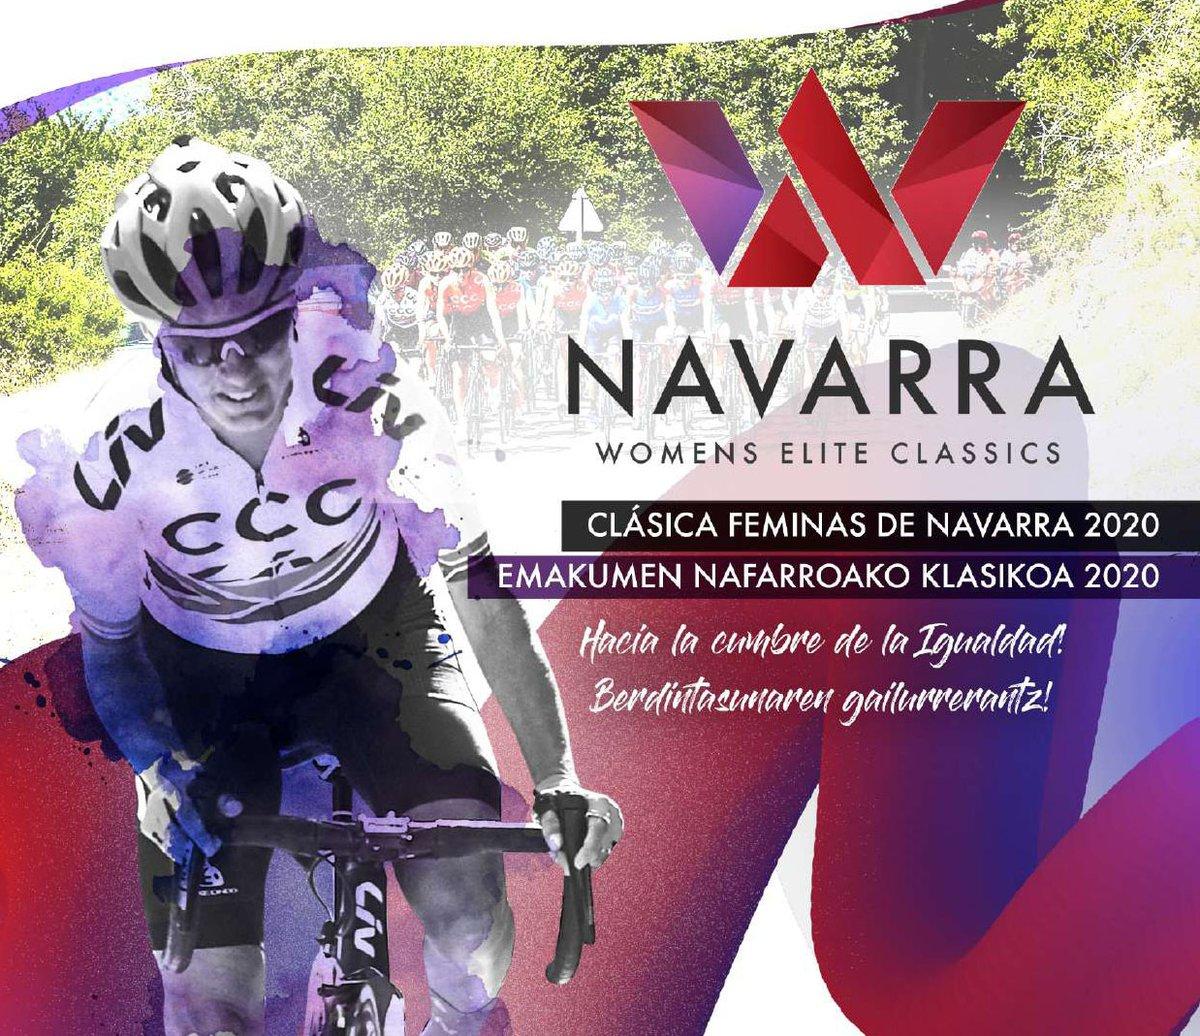 Conseguirá Bastianelli vencer em Navarra?